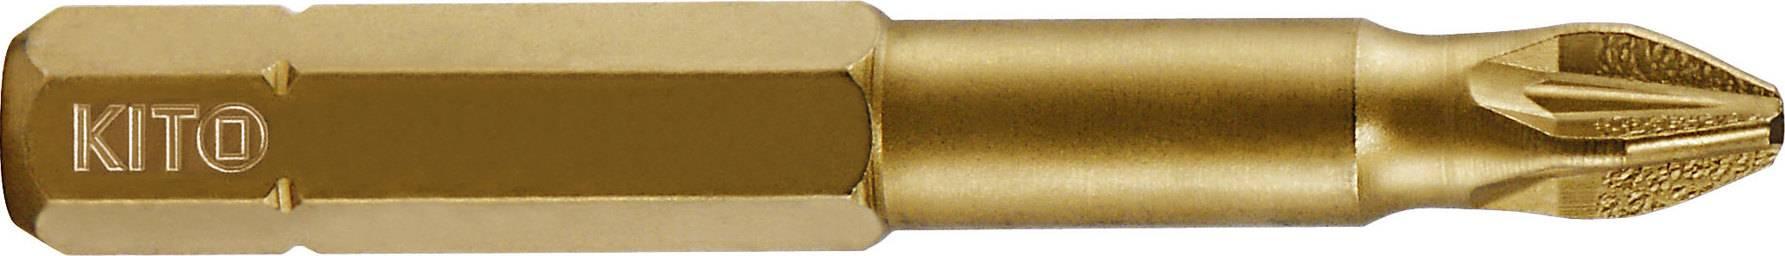 hrot, PZ 3x50mm, S2/TiN 4821203 KITO